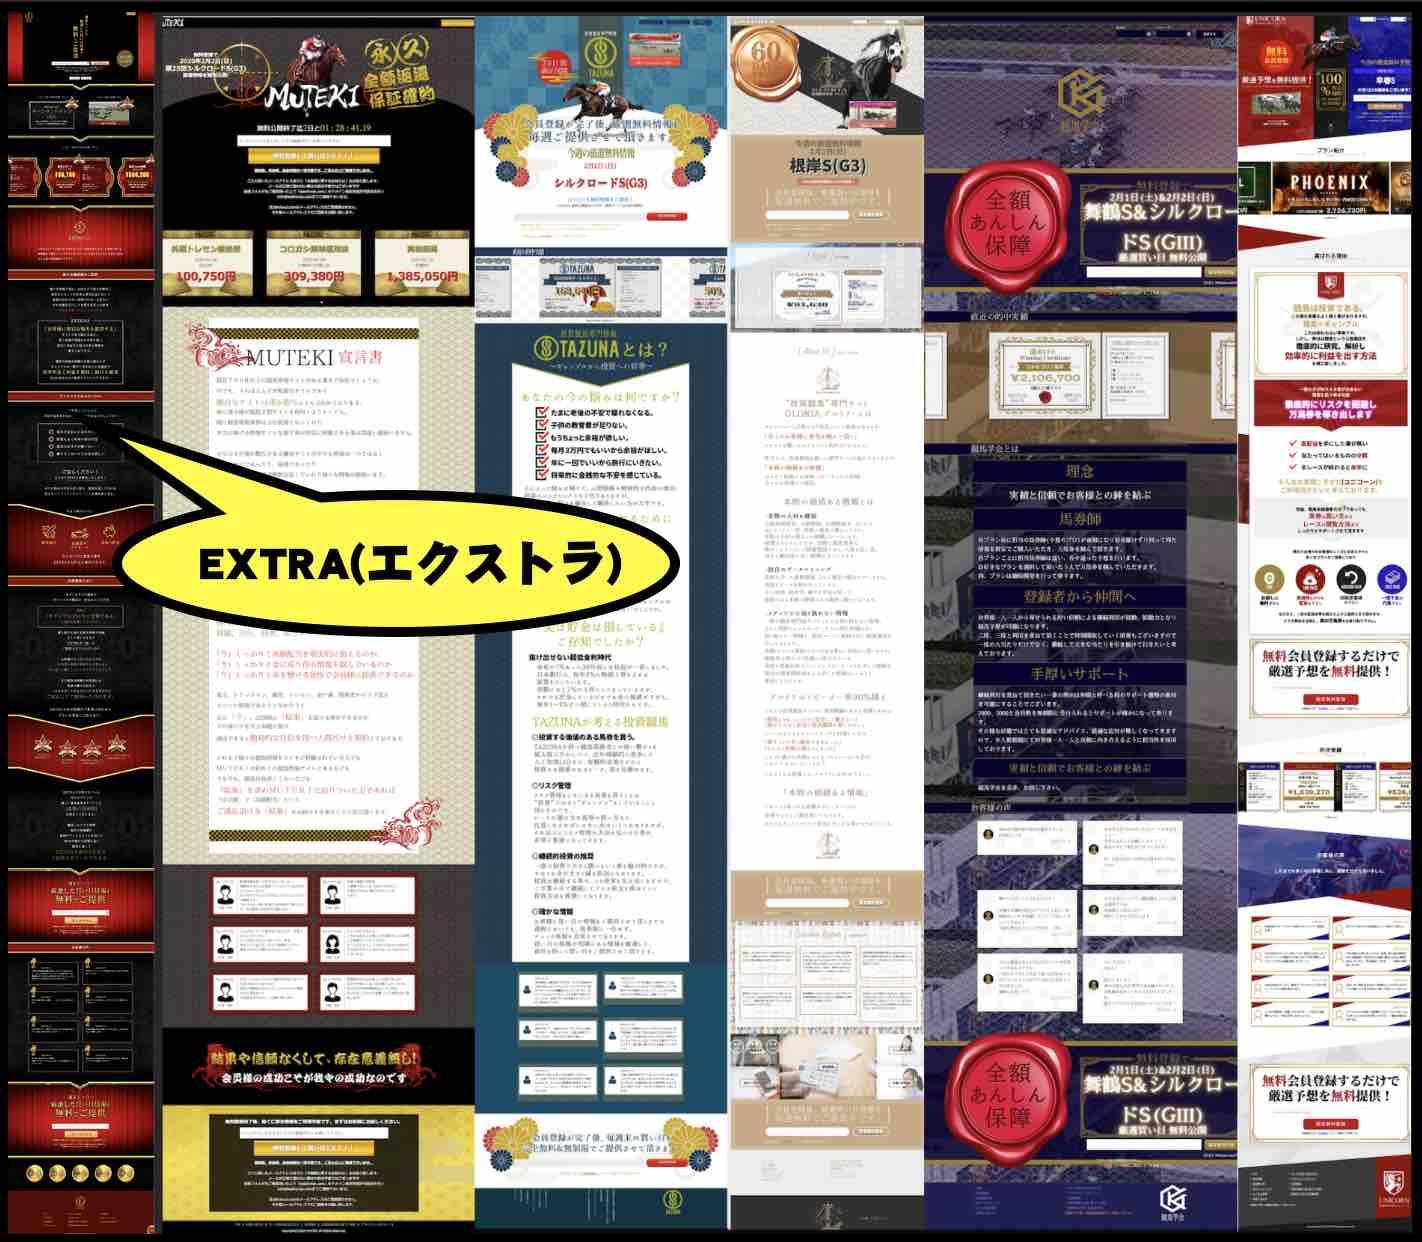 EXTRA(エクストラ)という競馬予想サイトのグループサイトと激似